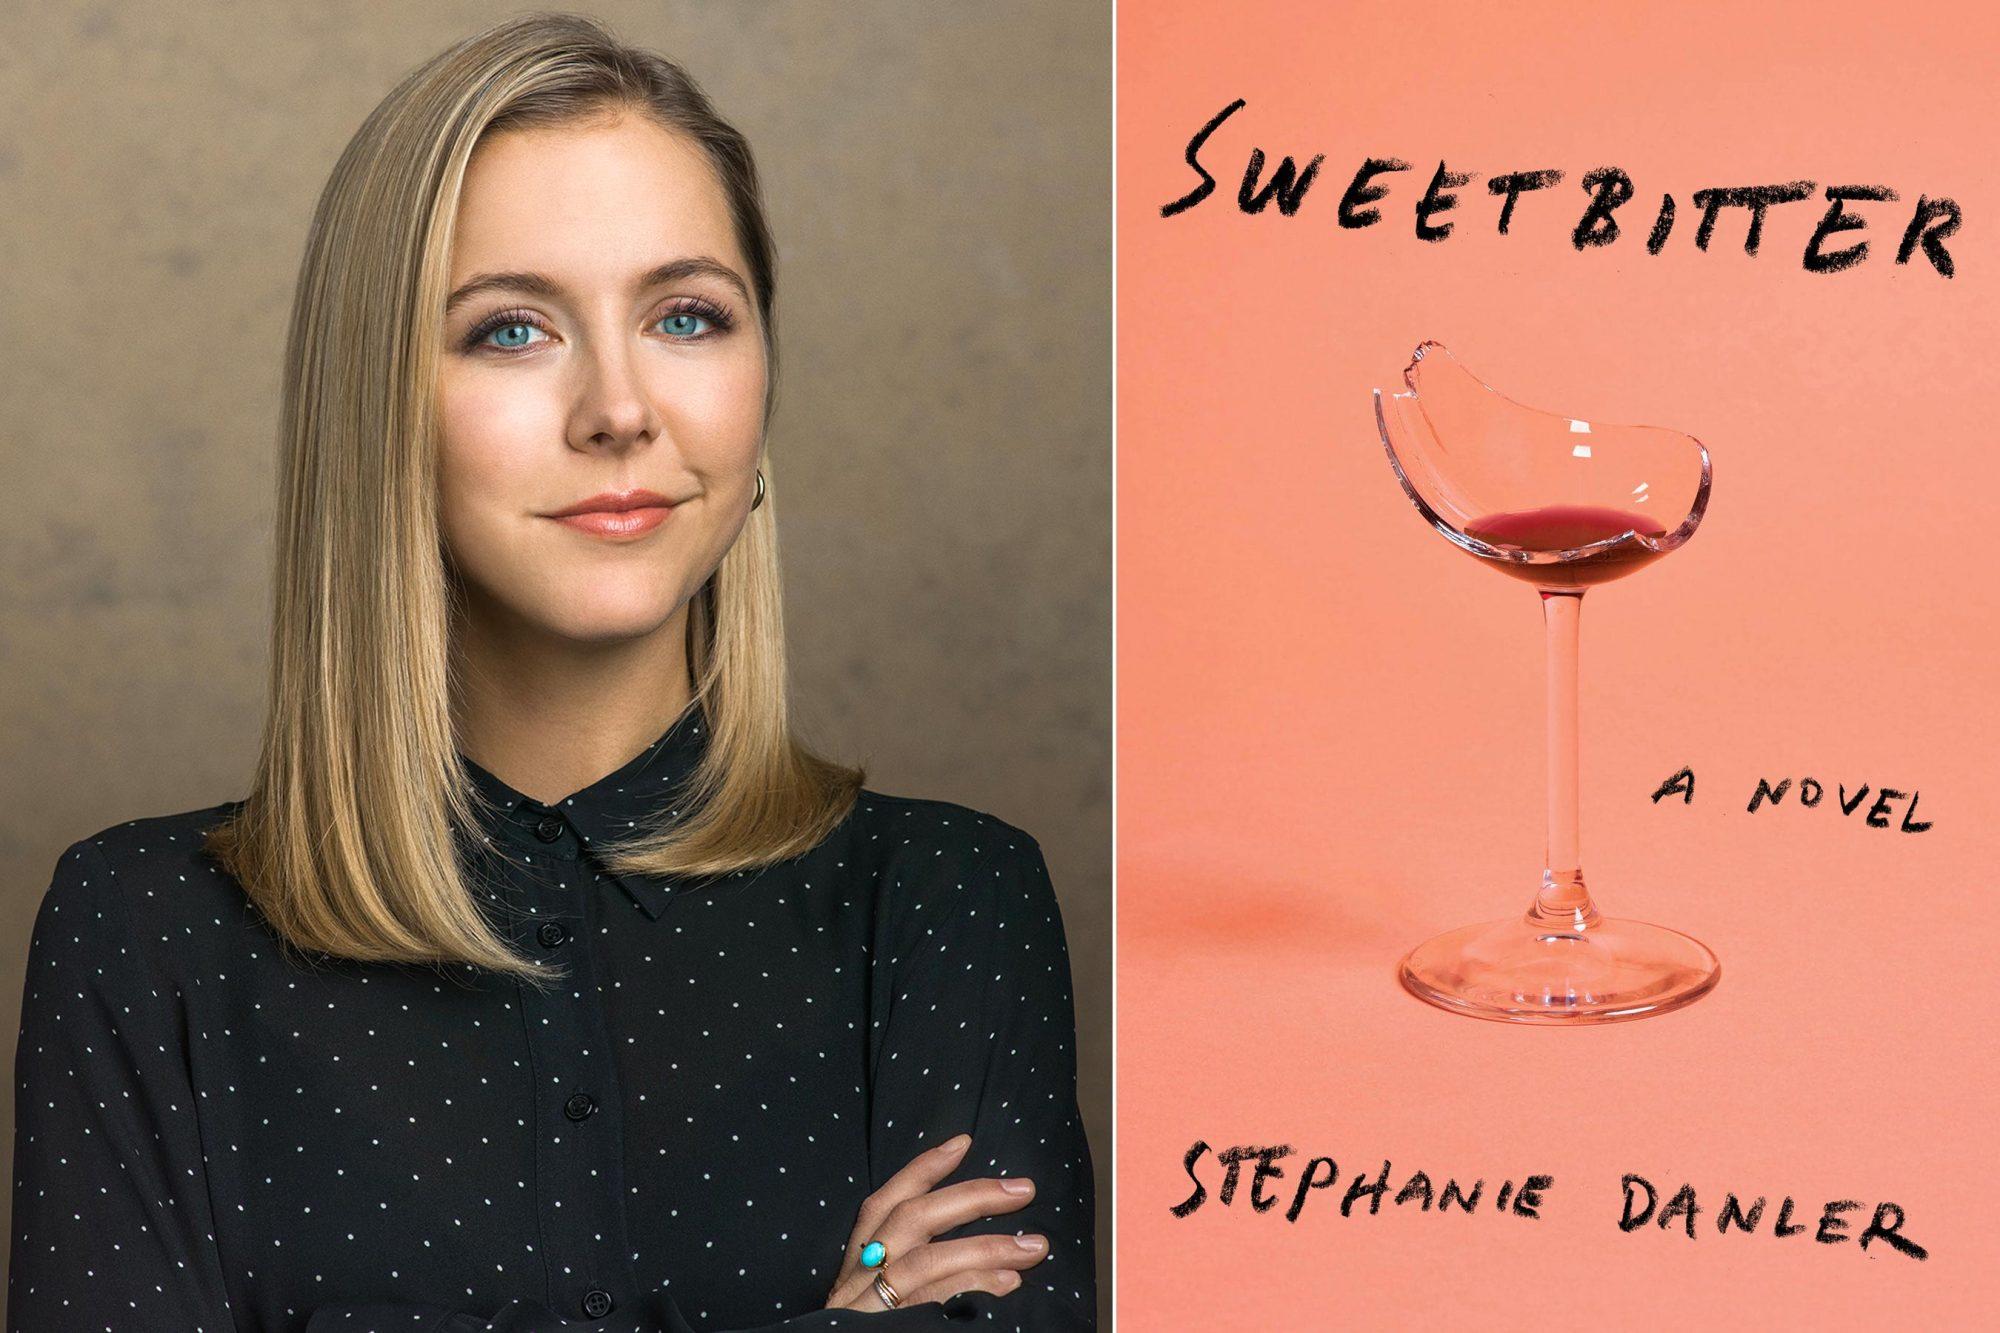 sweetbitter-2